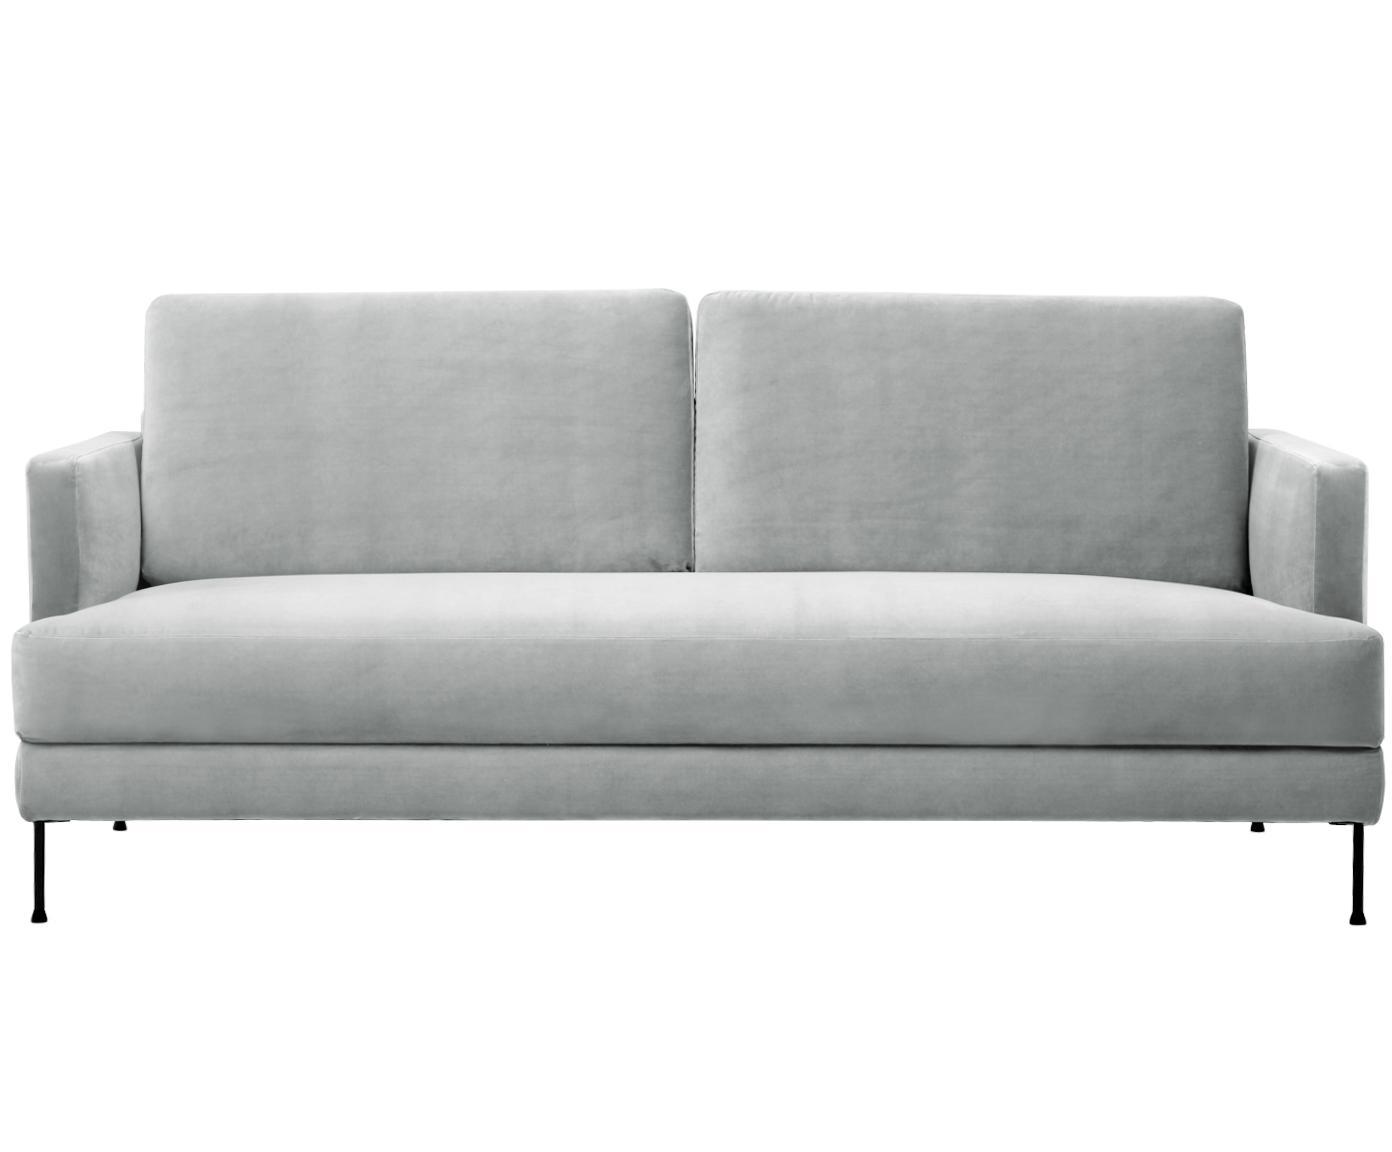 Full Size of Big Sofa Abnehmbarer Bezug Hussen Modulares Mit Abnehmbarem Ikea Abnehmbaren Sofas Grau Abnehmbar Waschbar Samt Fluente 3 Sitzer Westwingnow Minotti Erpo Sofa Sofa Mit Abnehmbaren Bezug